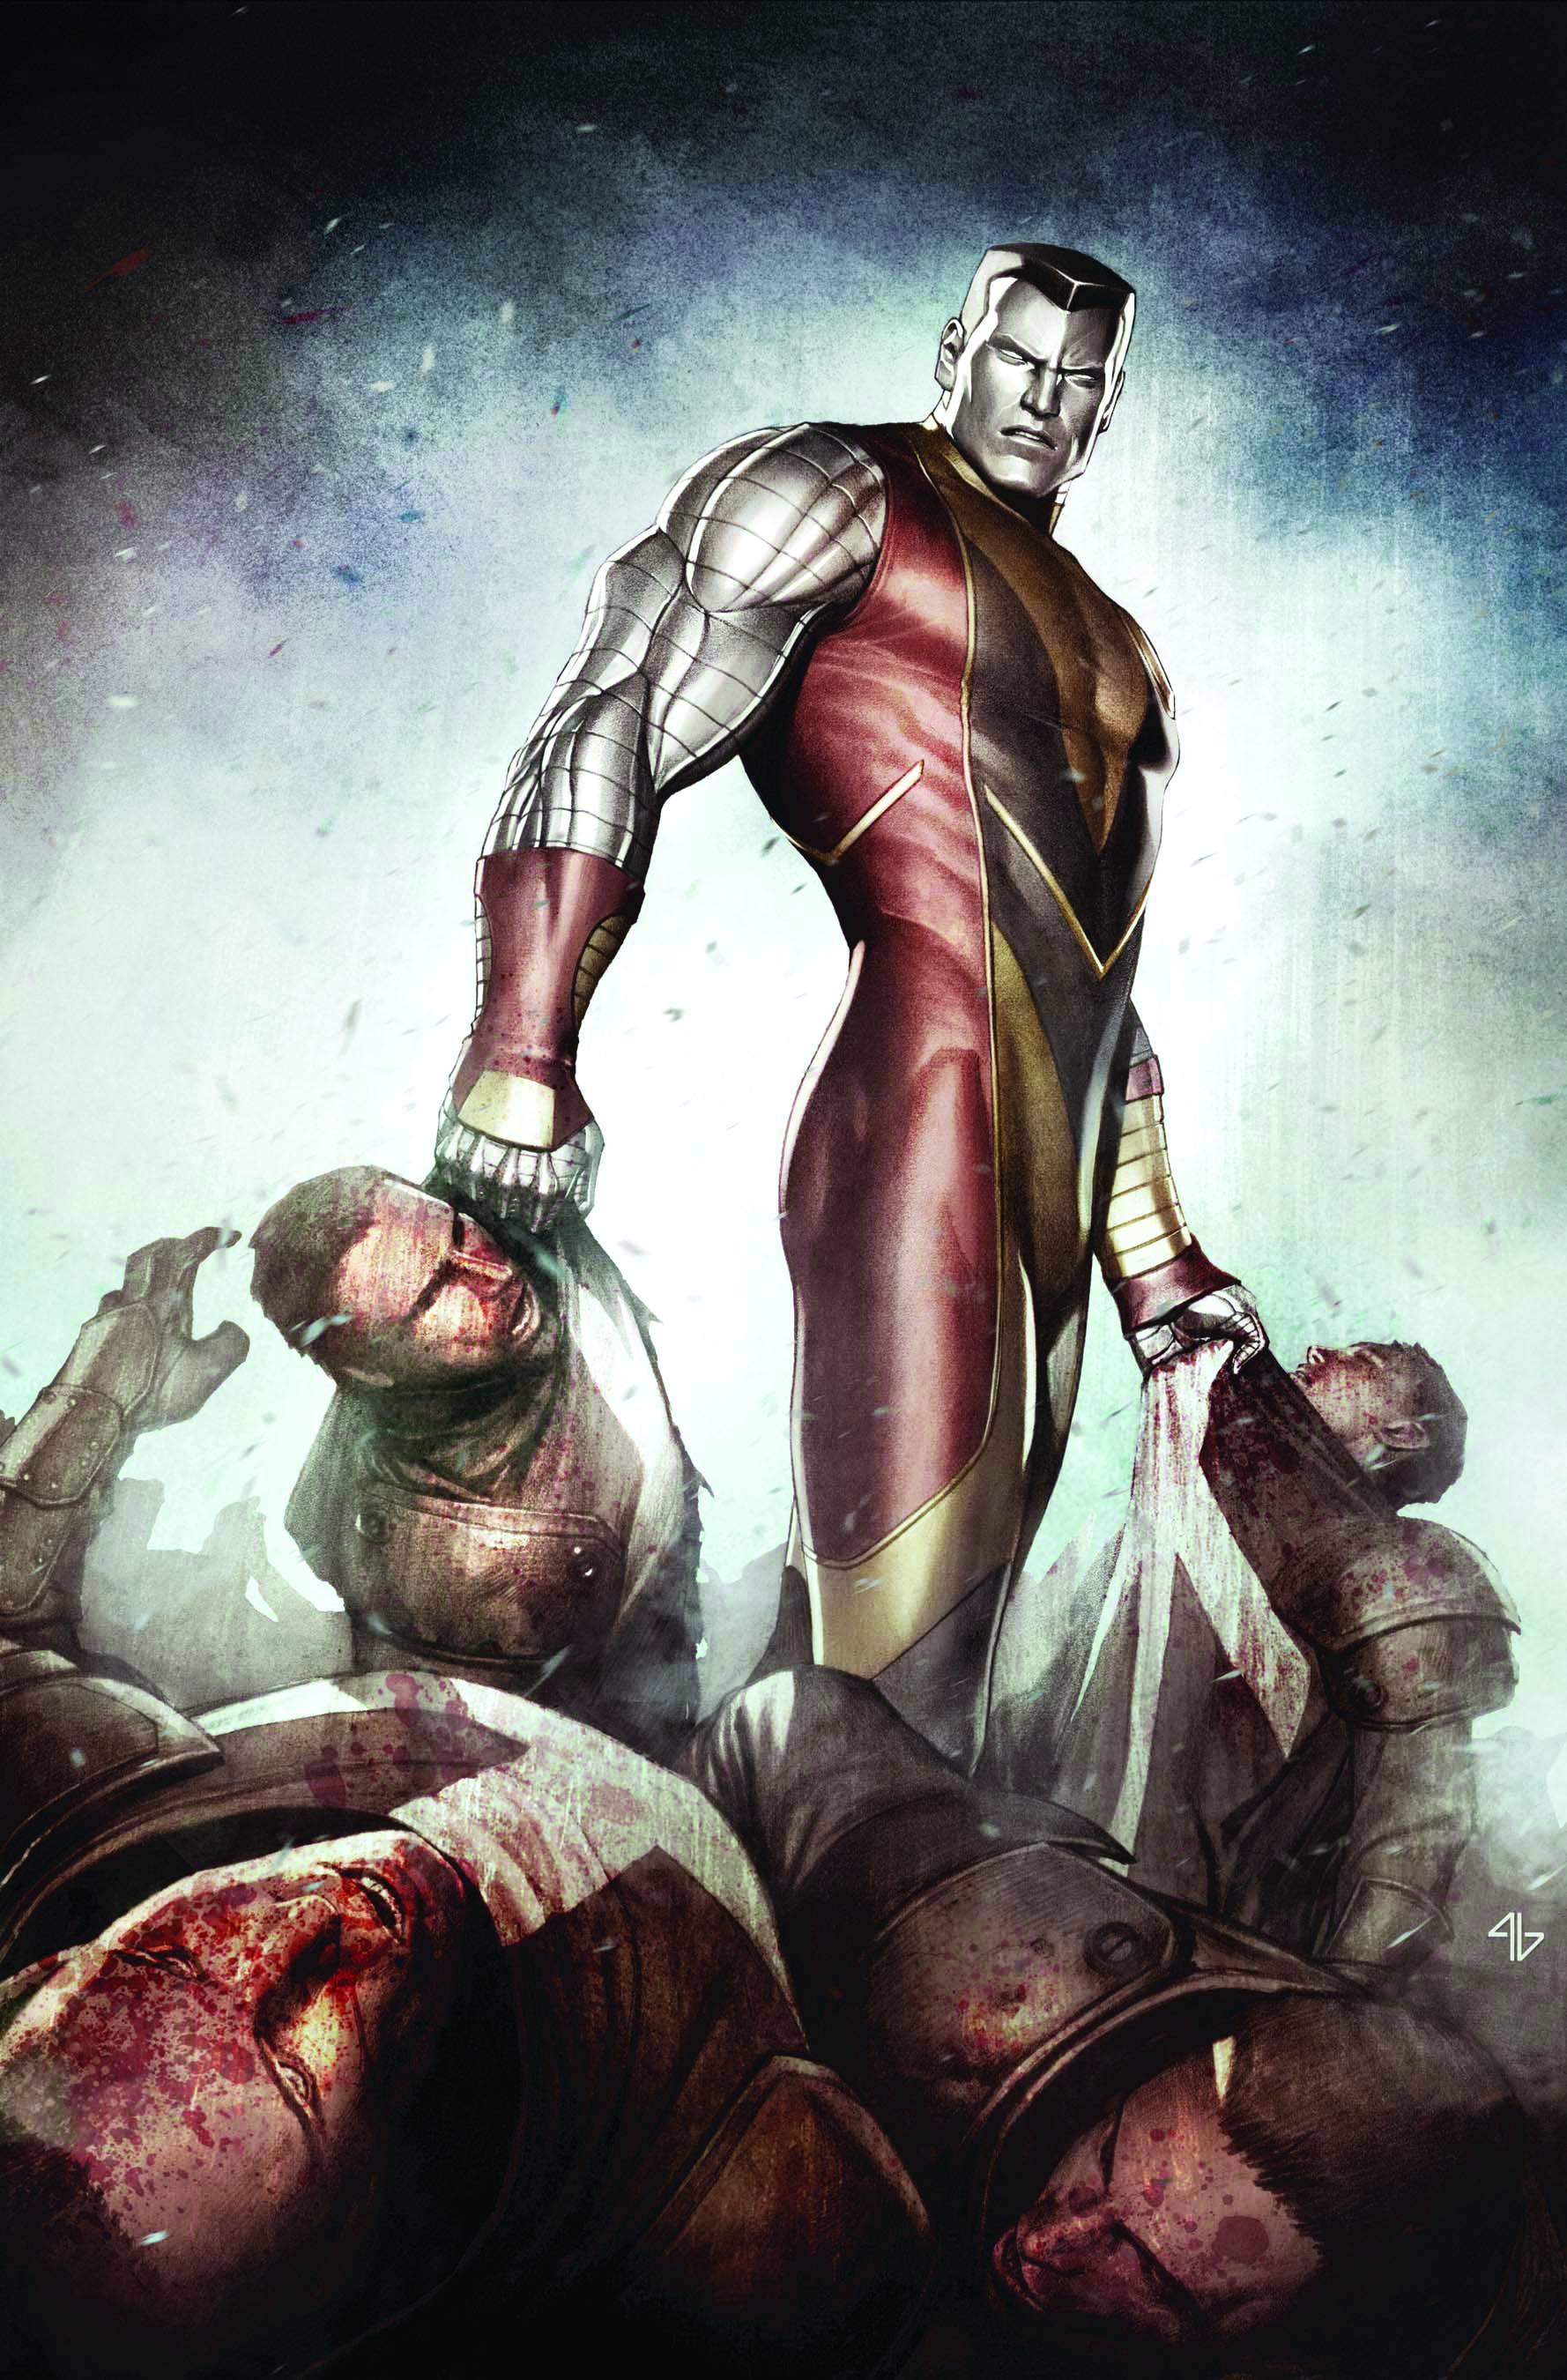 Colossus เอ็กซ์เมน